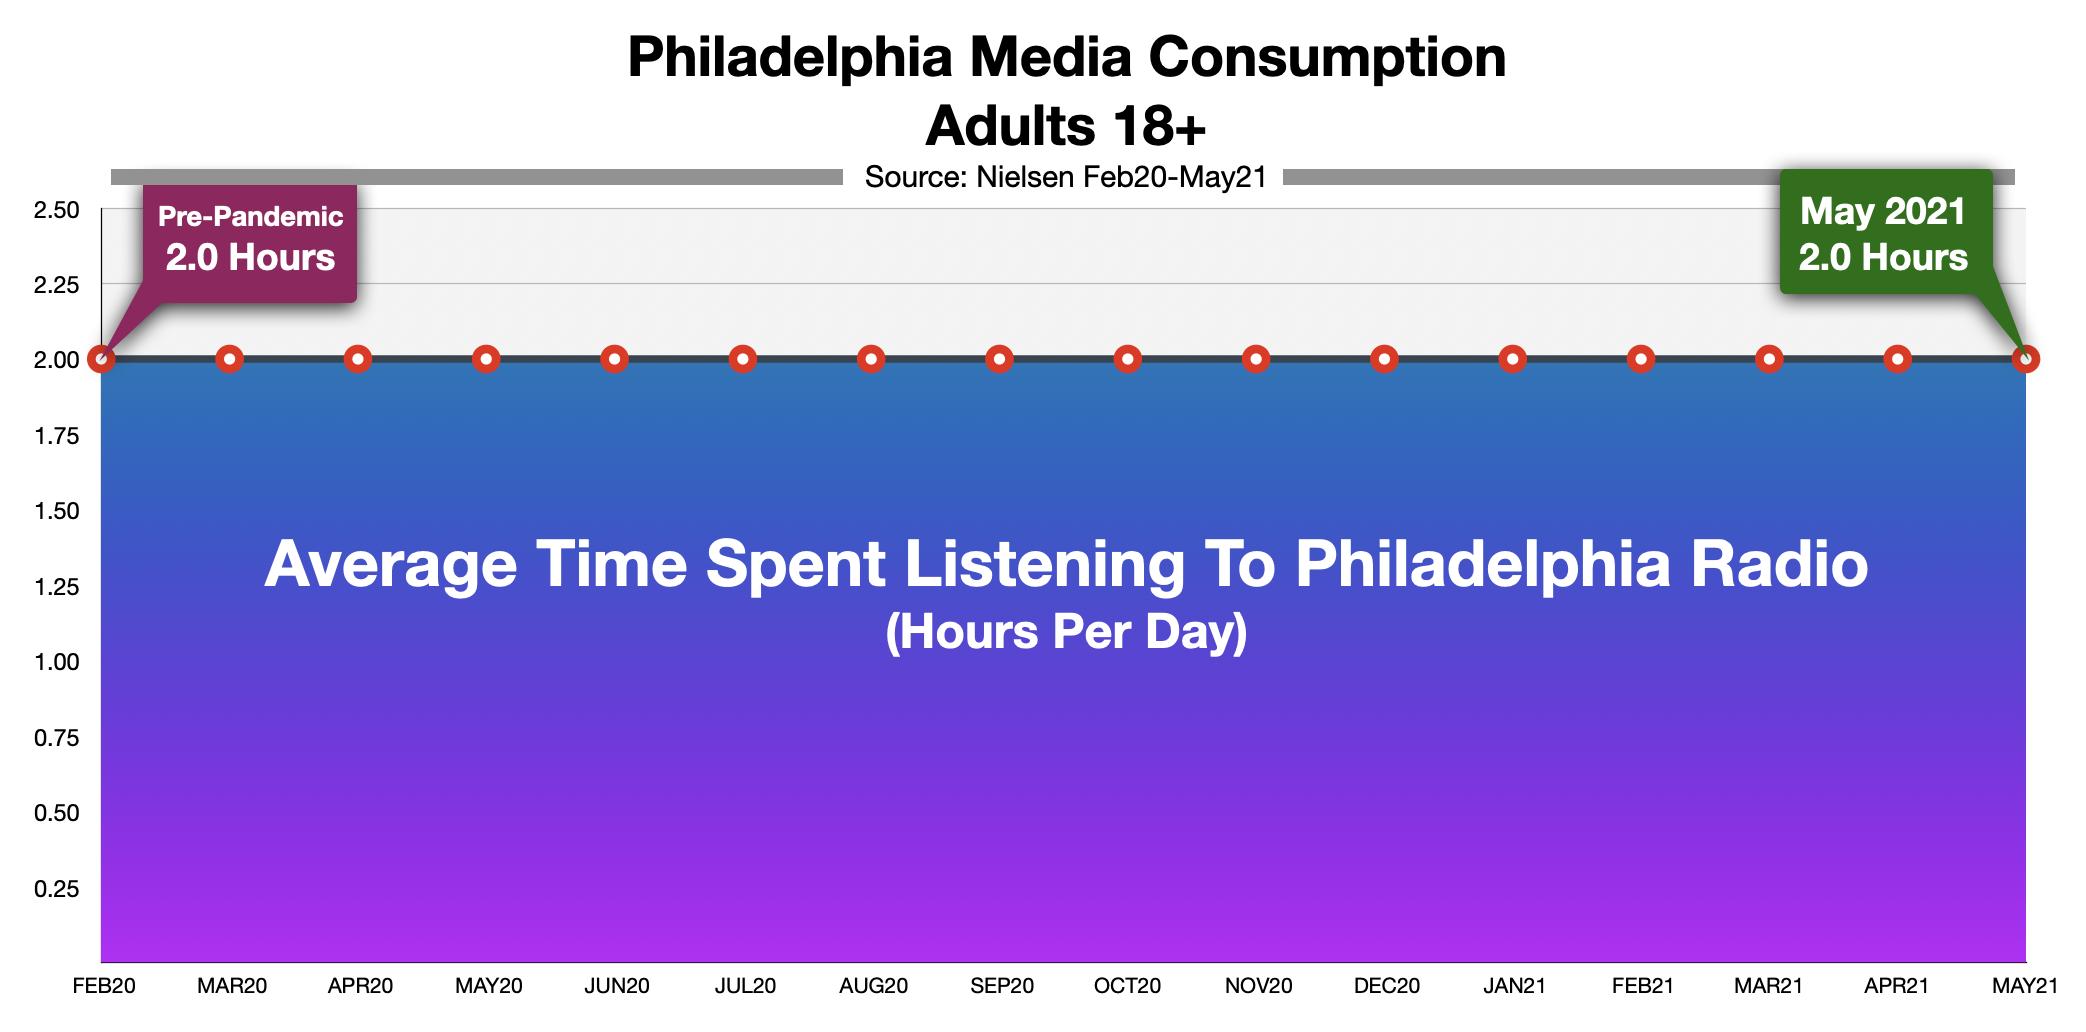 Advertising On Philadelphia Radio Time Spent Listening May 2021